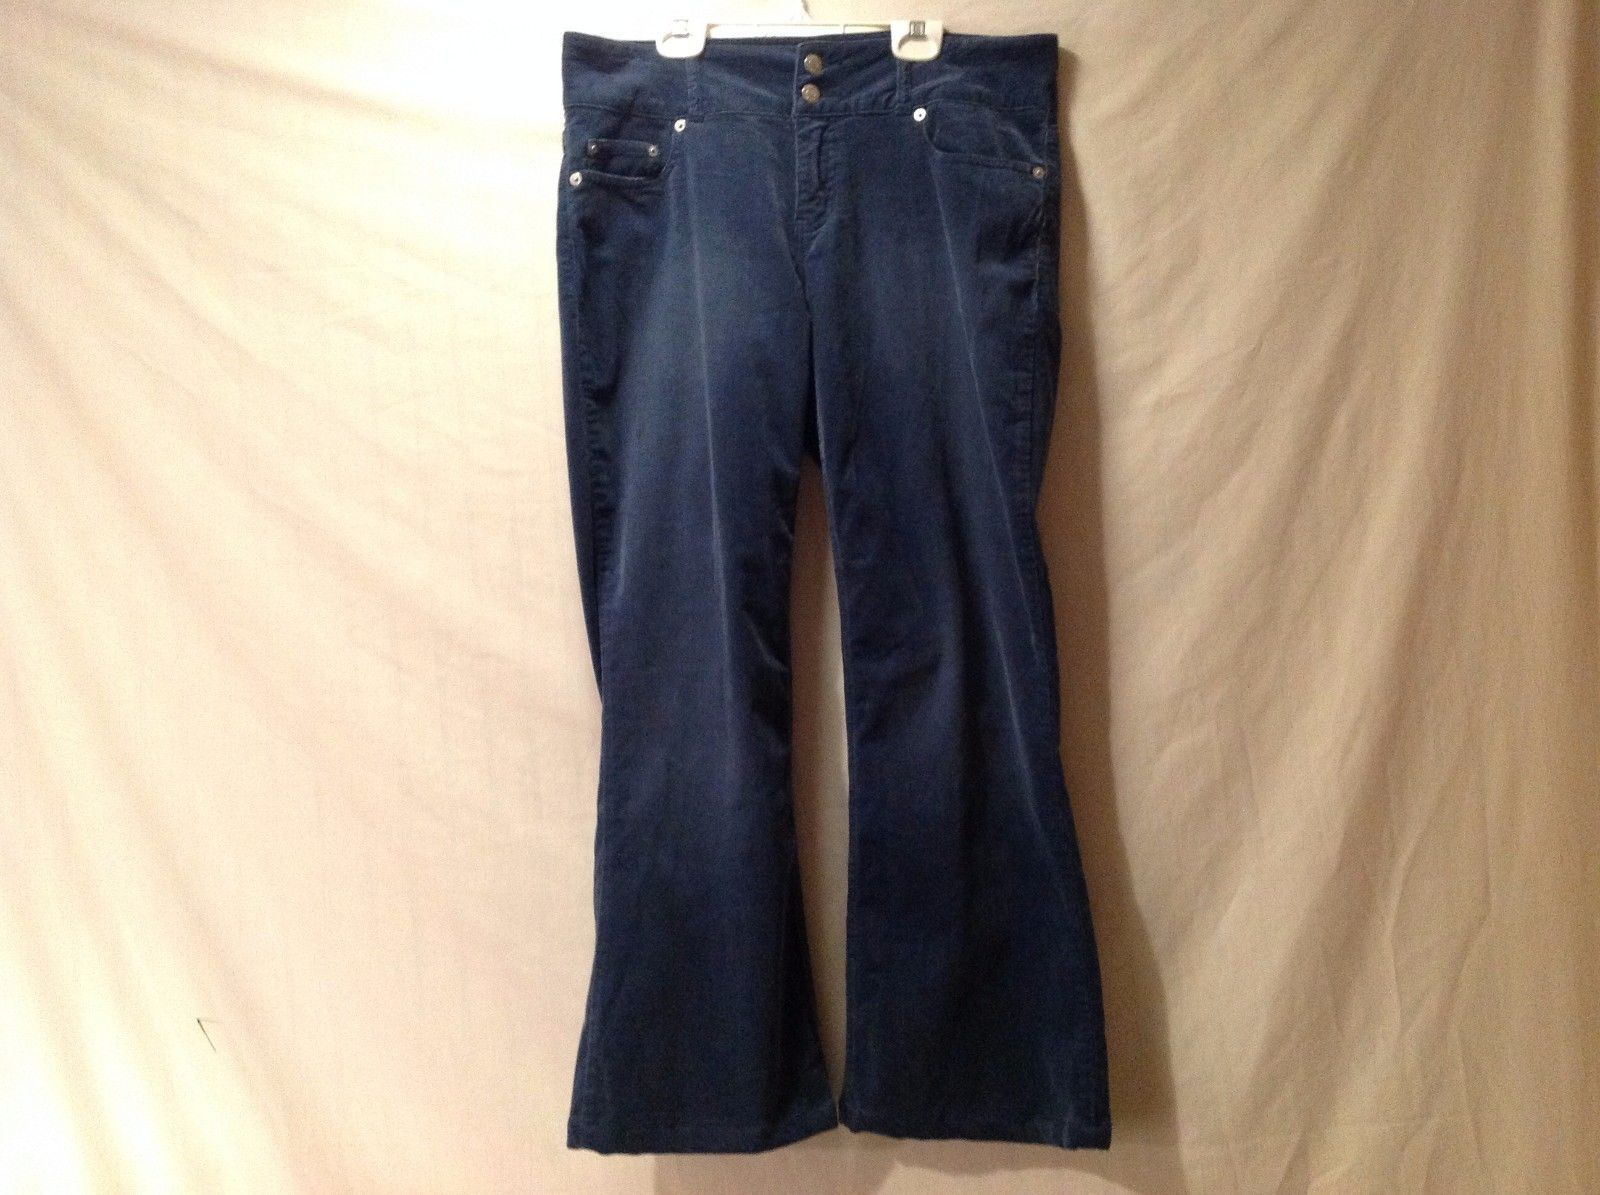 Great Condition London Jean Size 10 Cotton Blend Blue Corduroy Stretch Pants